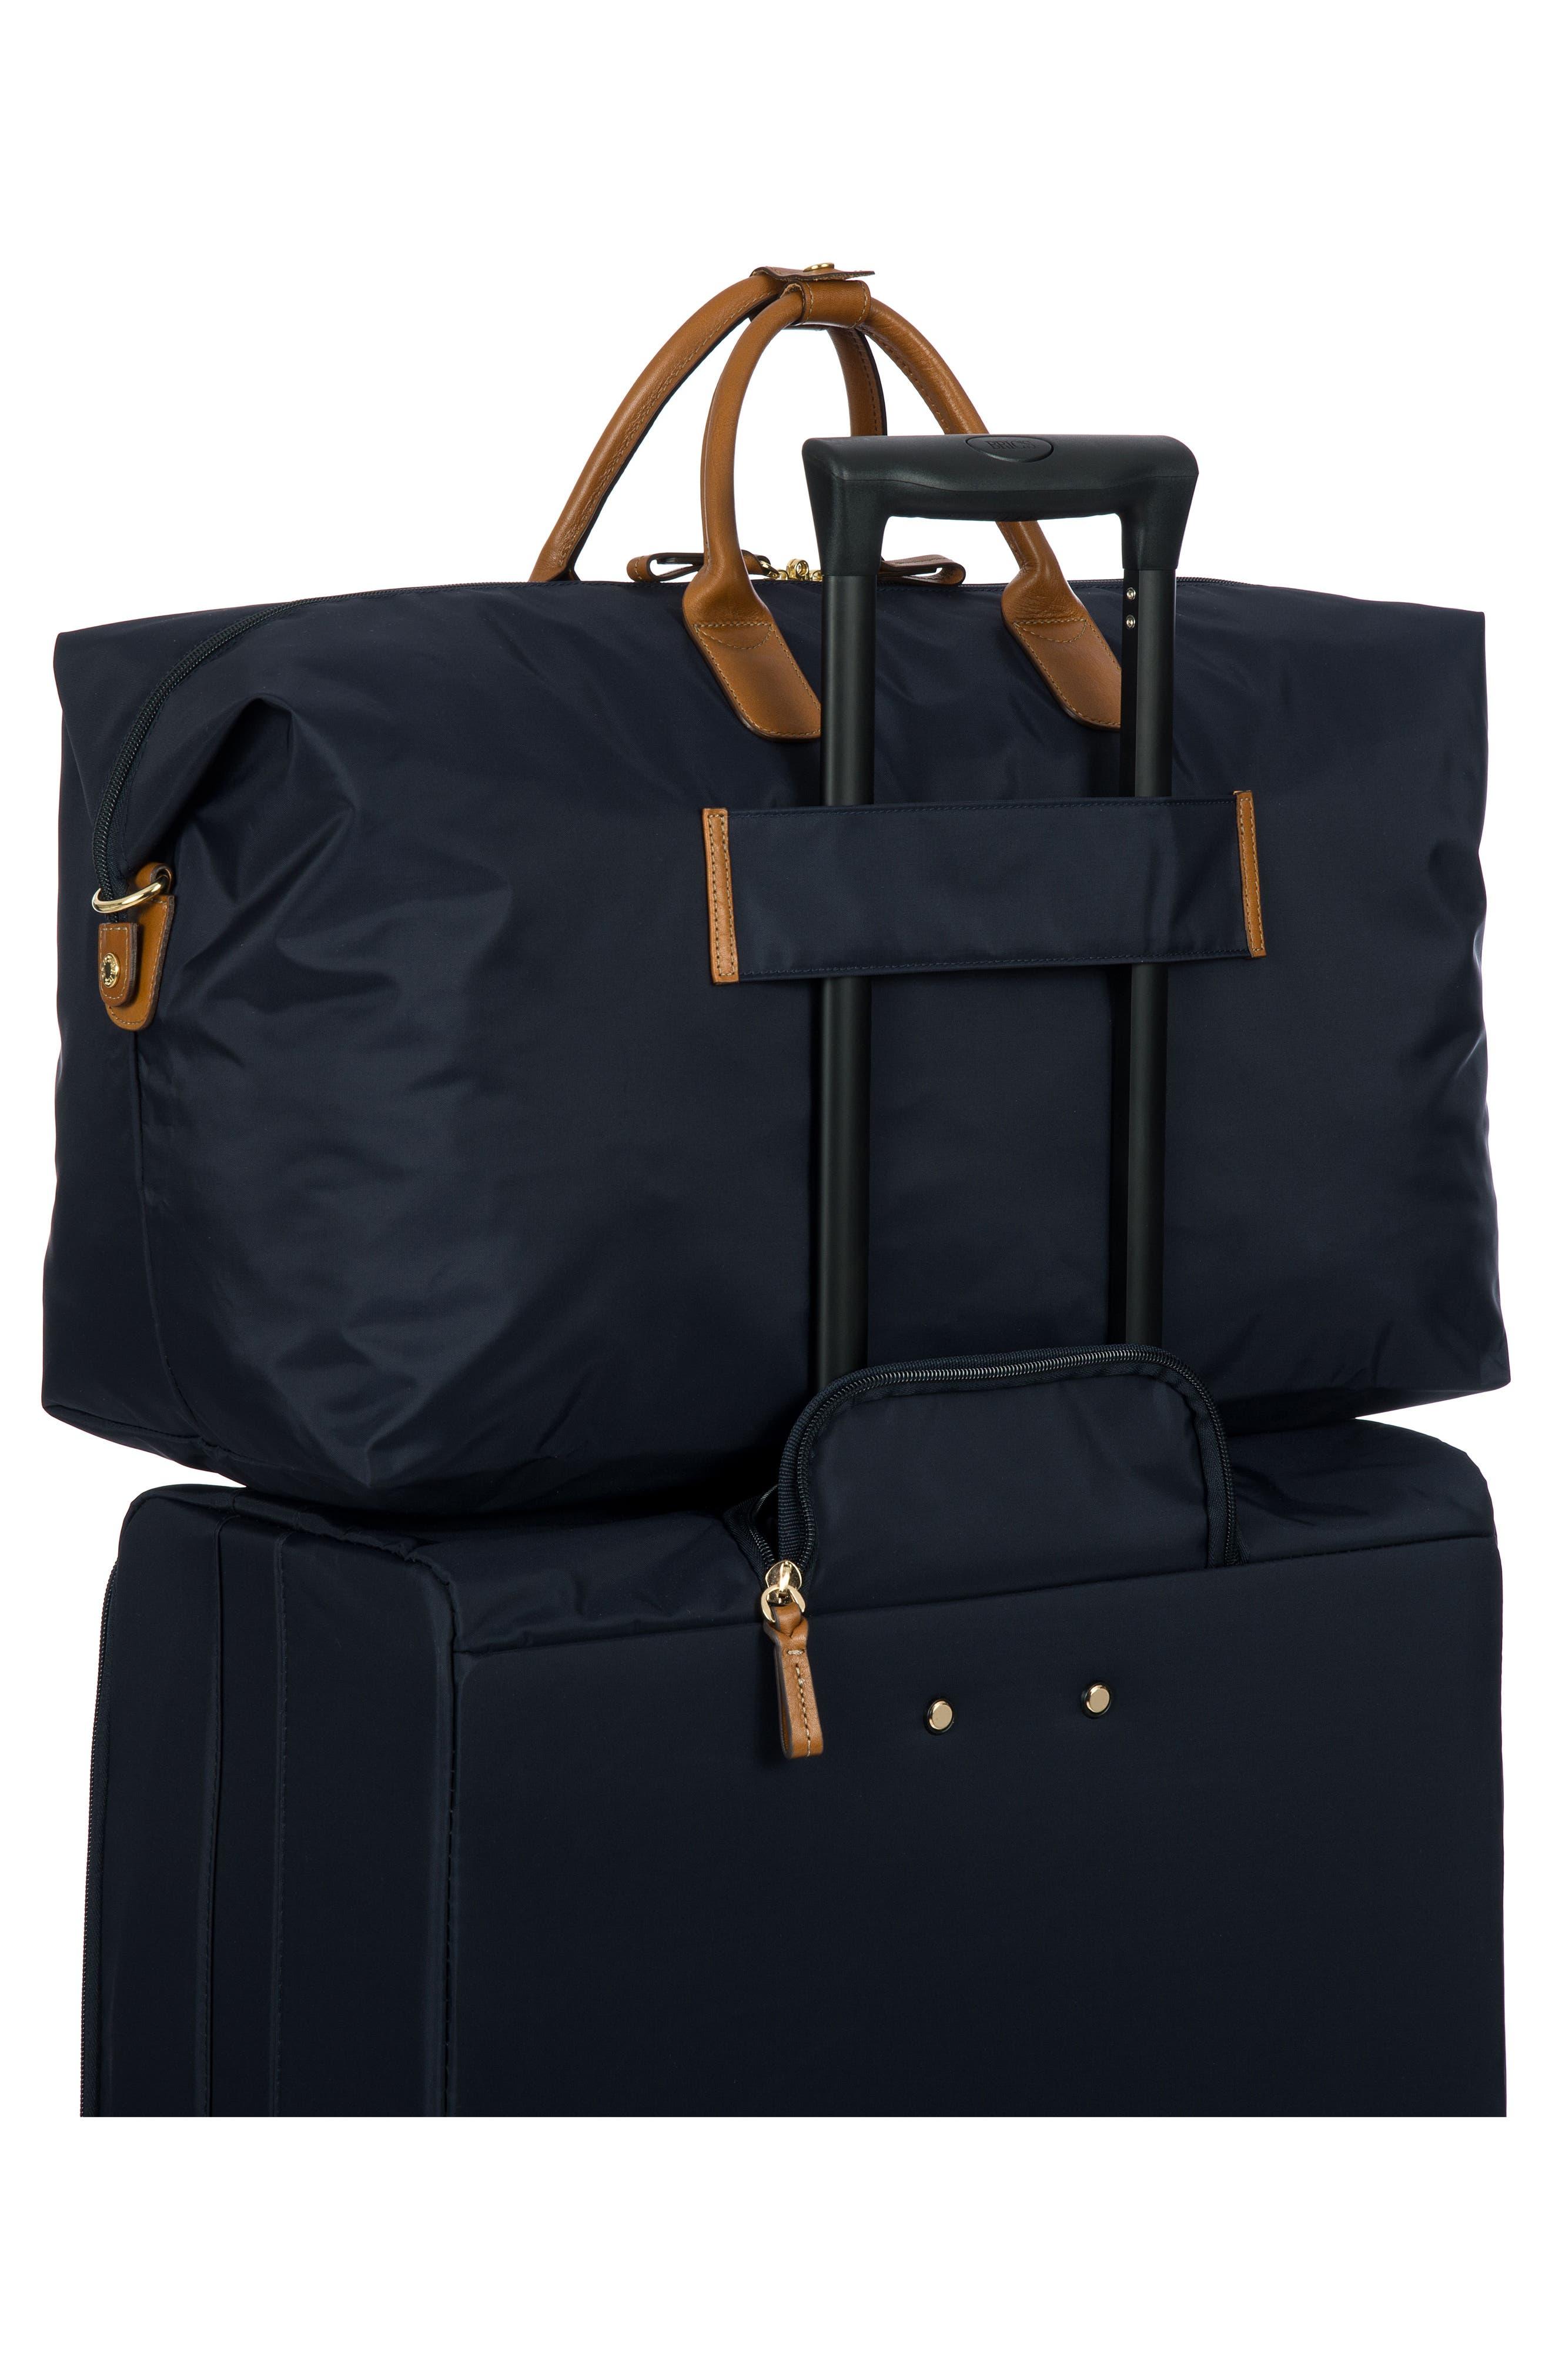 X-Bag Boarding 22-Inch Duffel Bag,                             Alternate thumbnail 2, color,                             NAVY